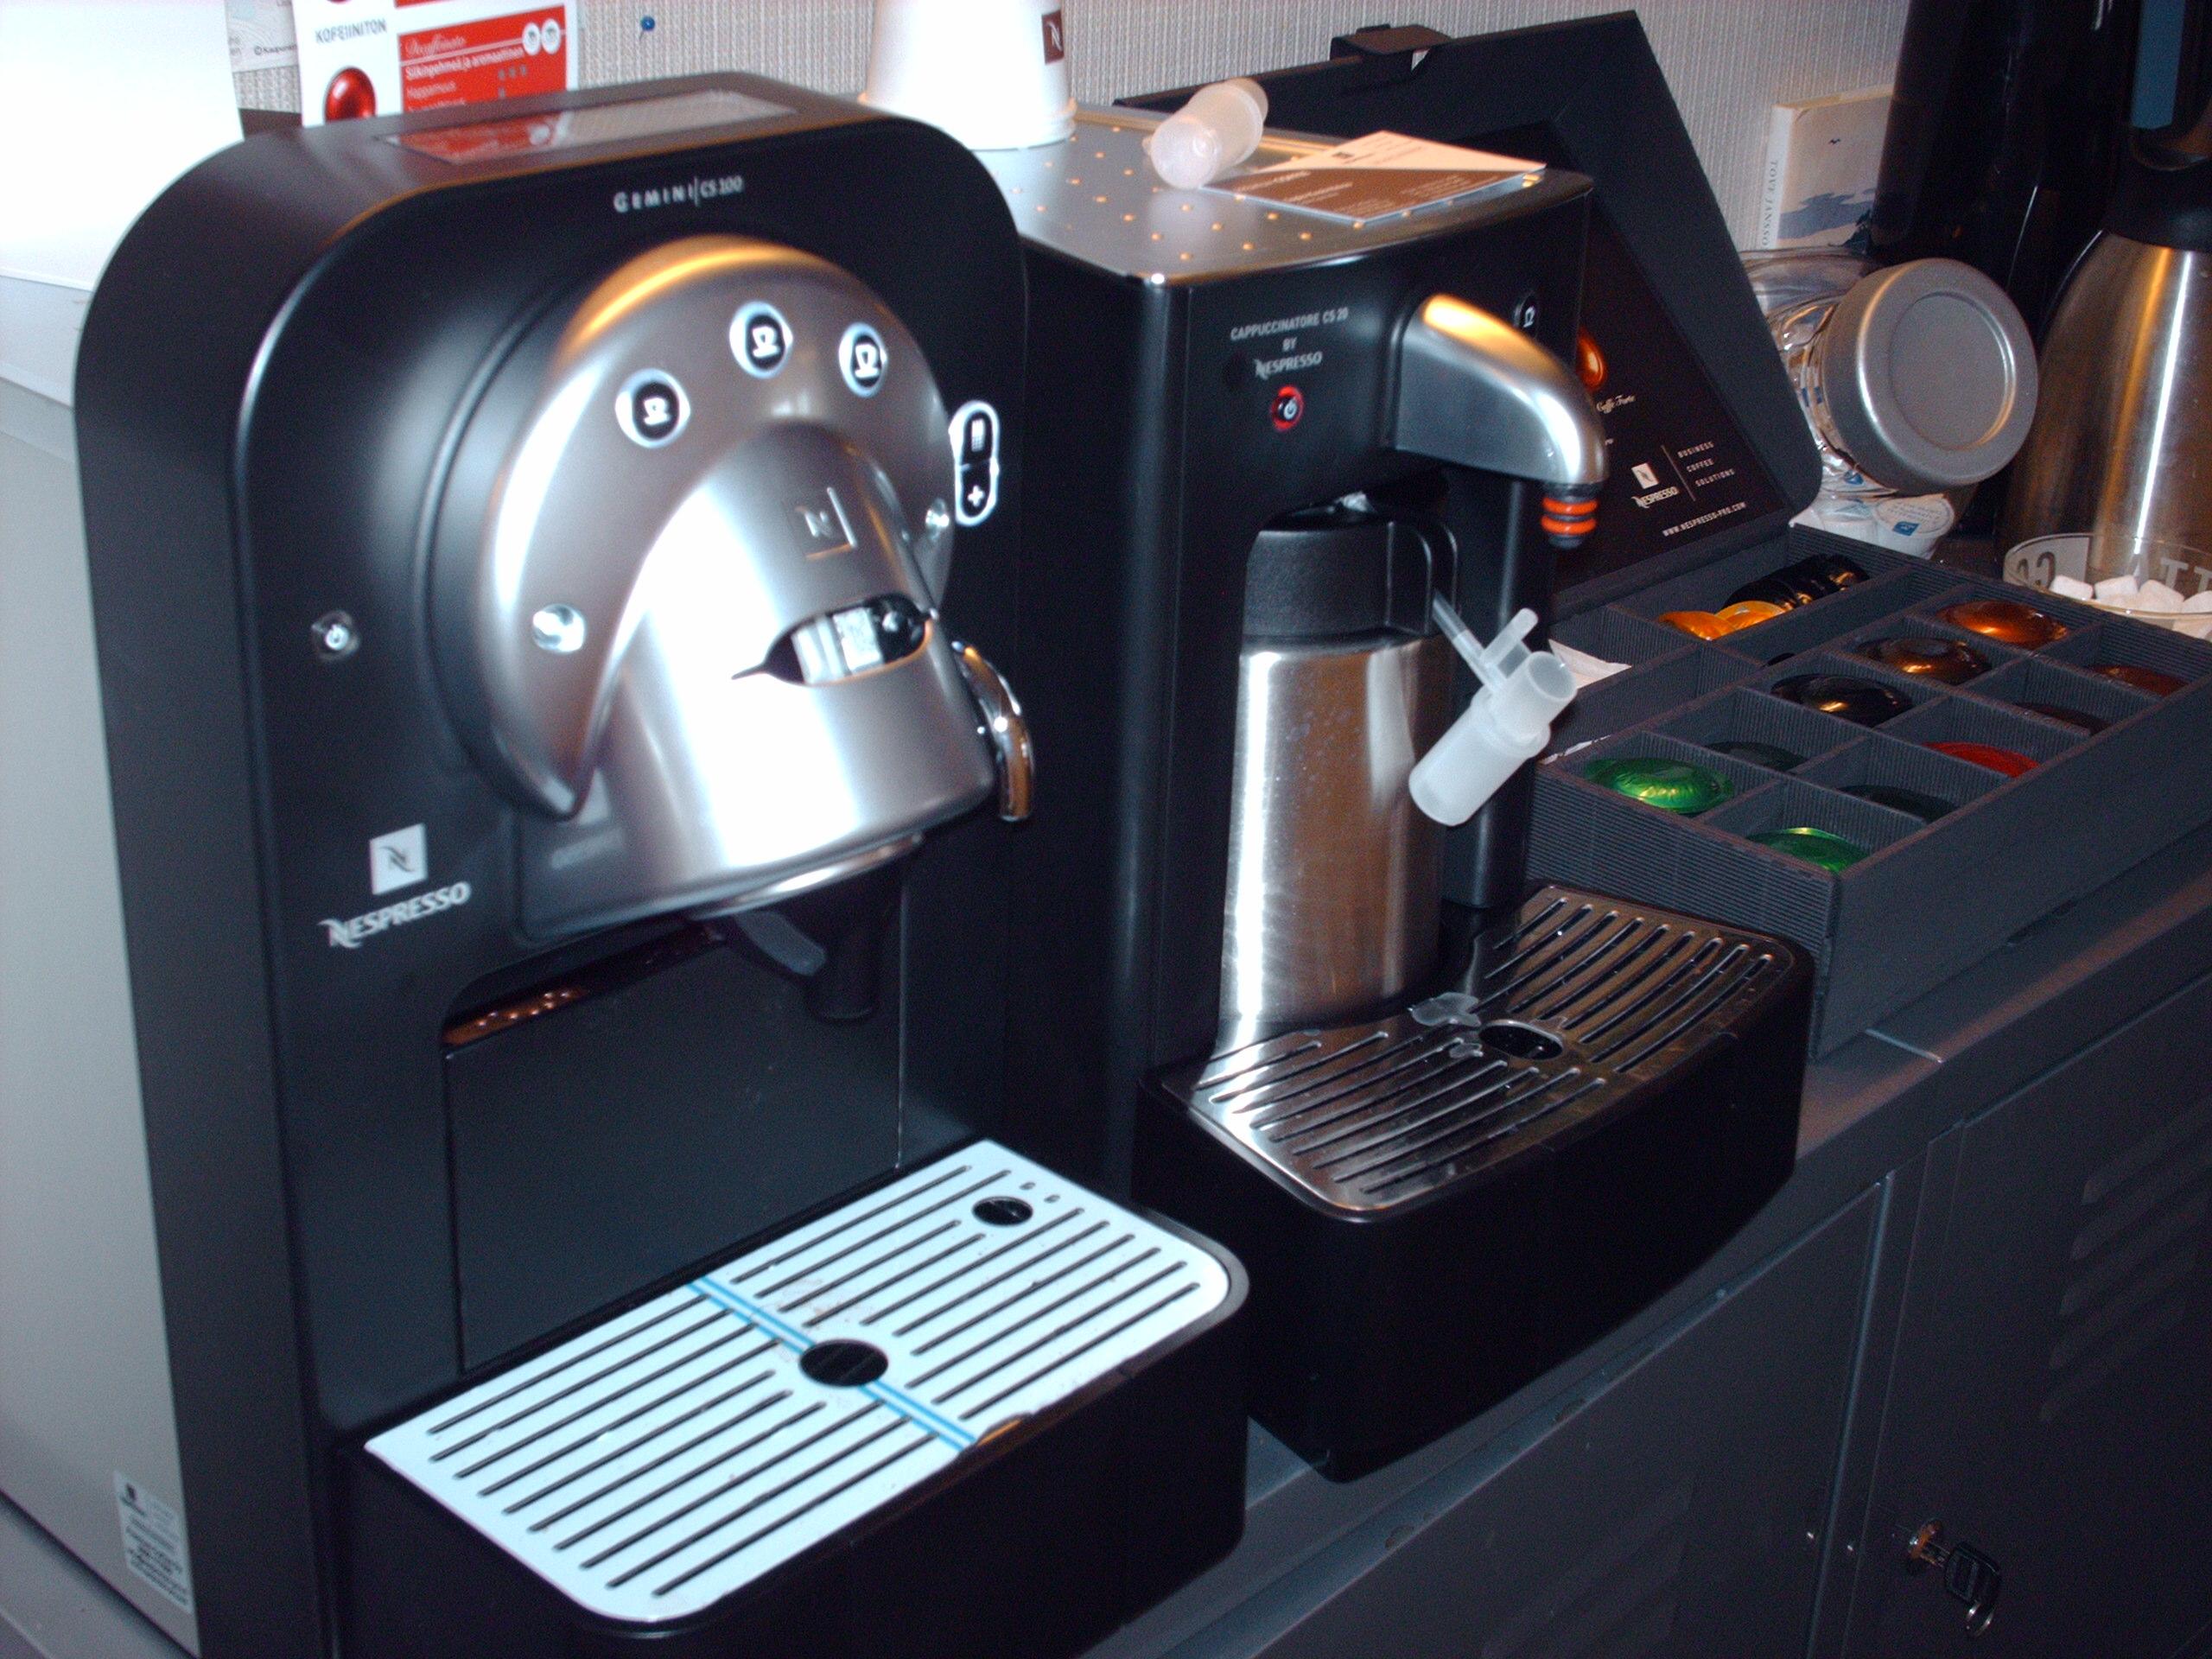 Playfair Coffee Distributing